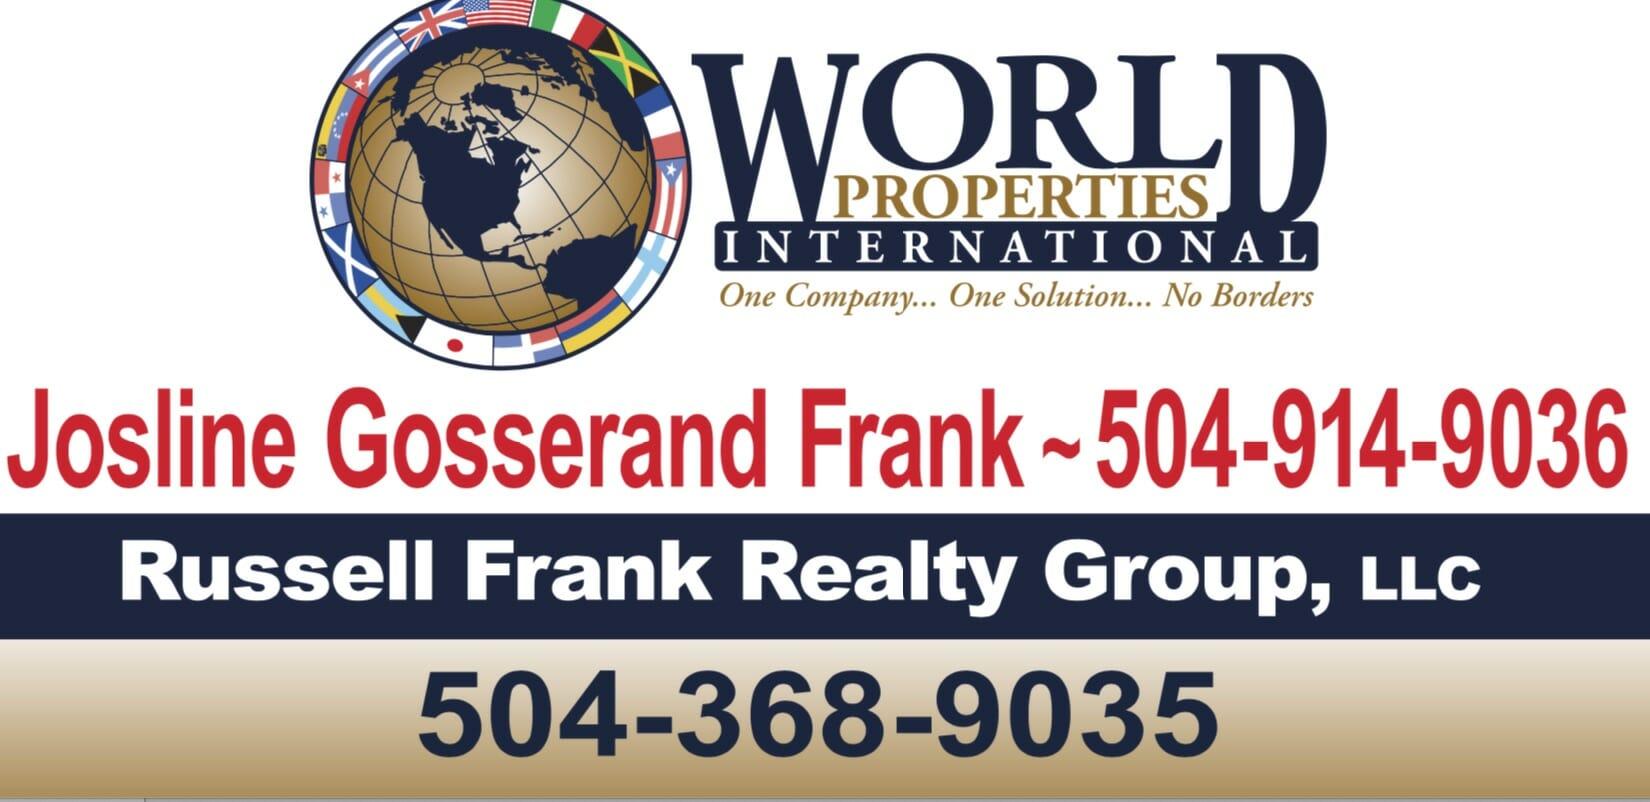 World Properties Logo